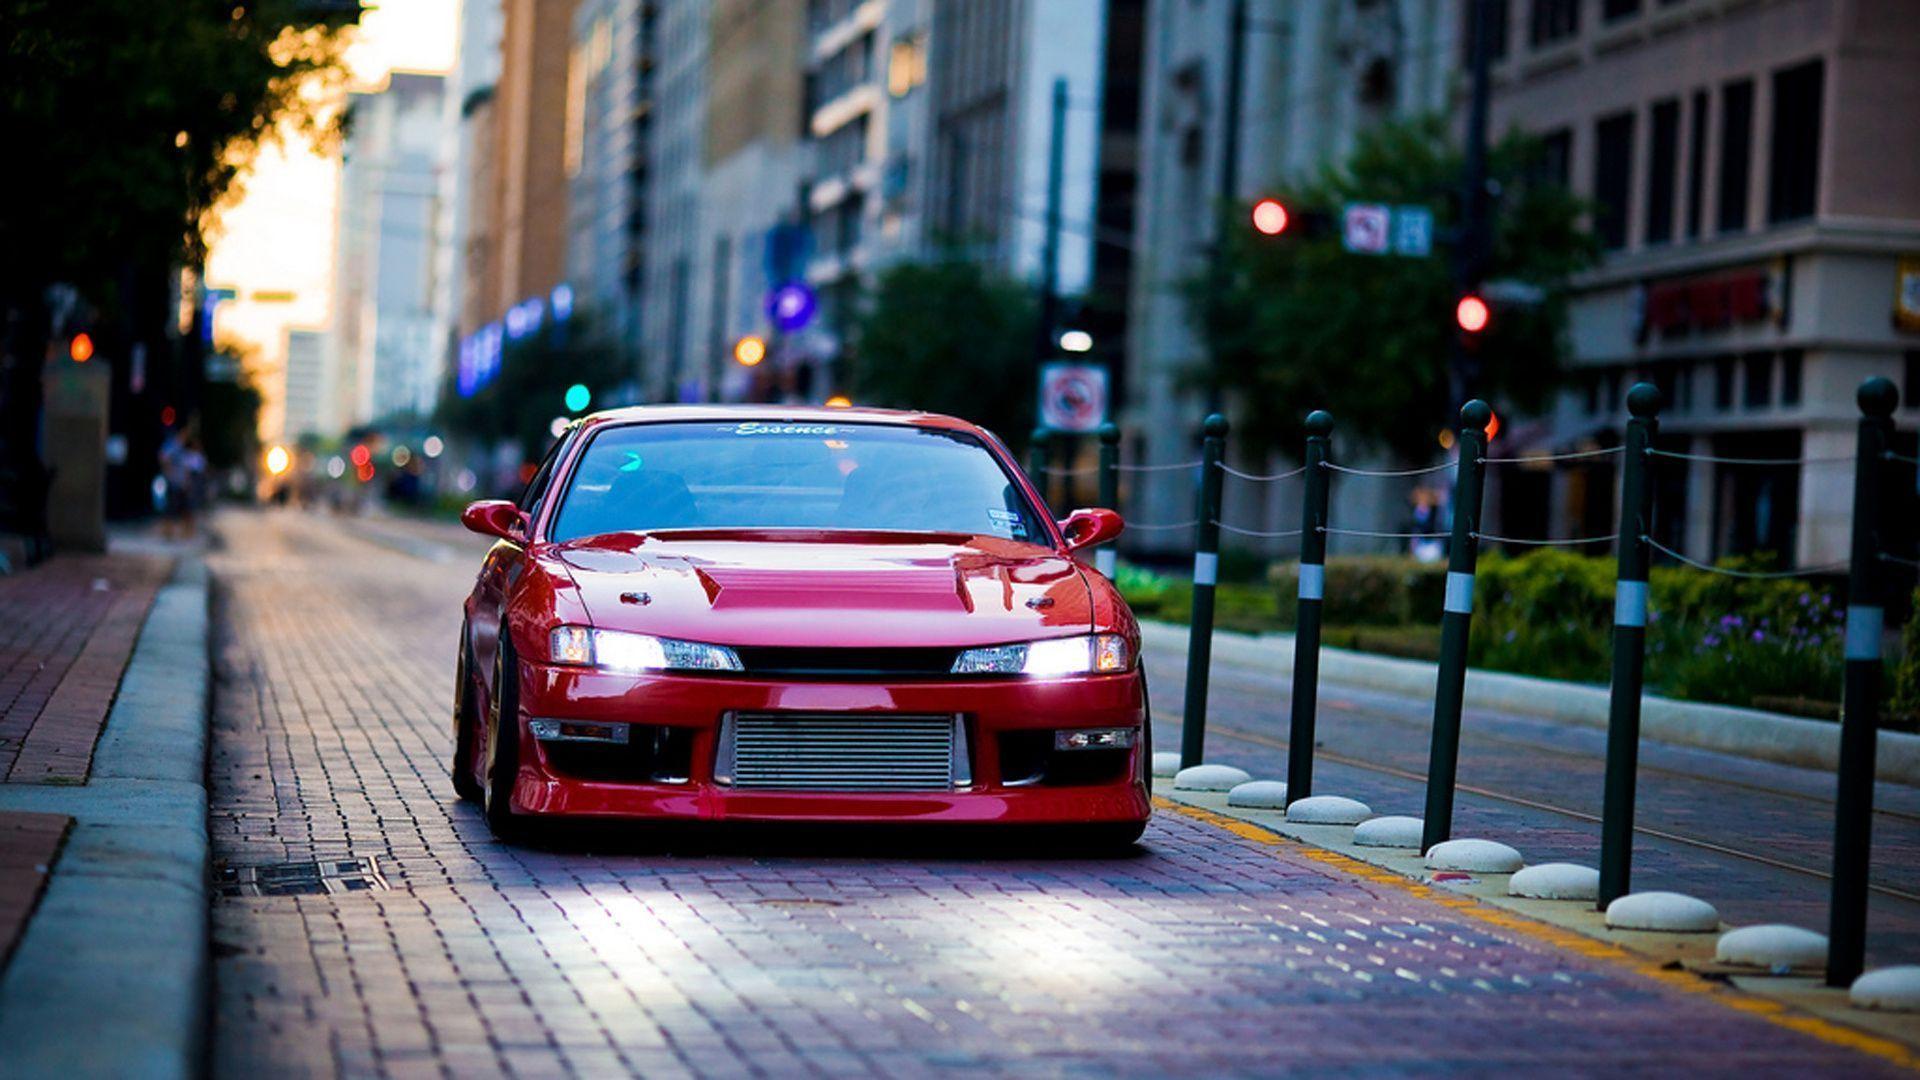 Images Of Amazing Car Drifting Hd Sc